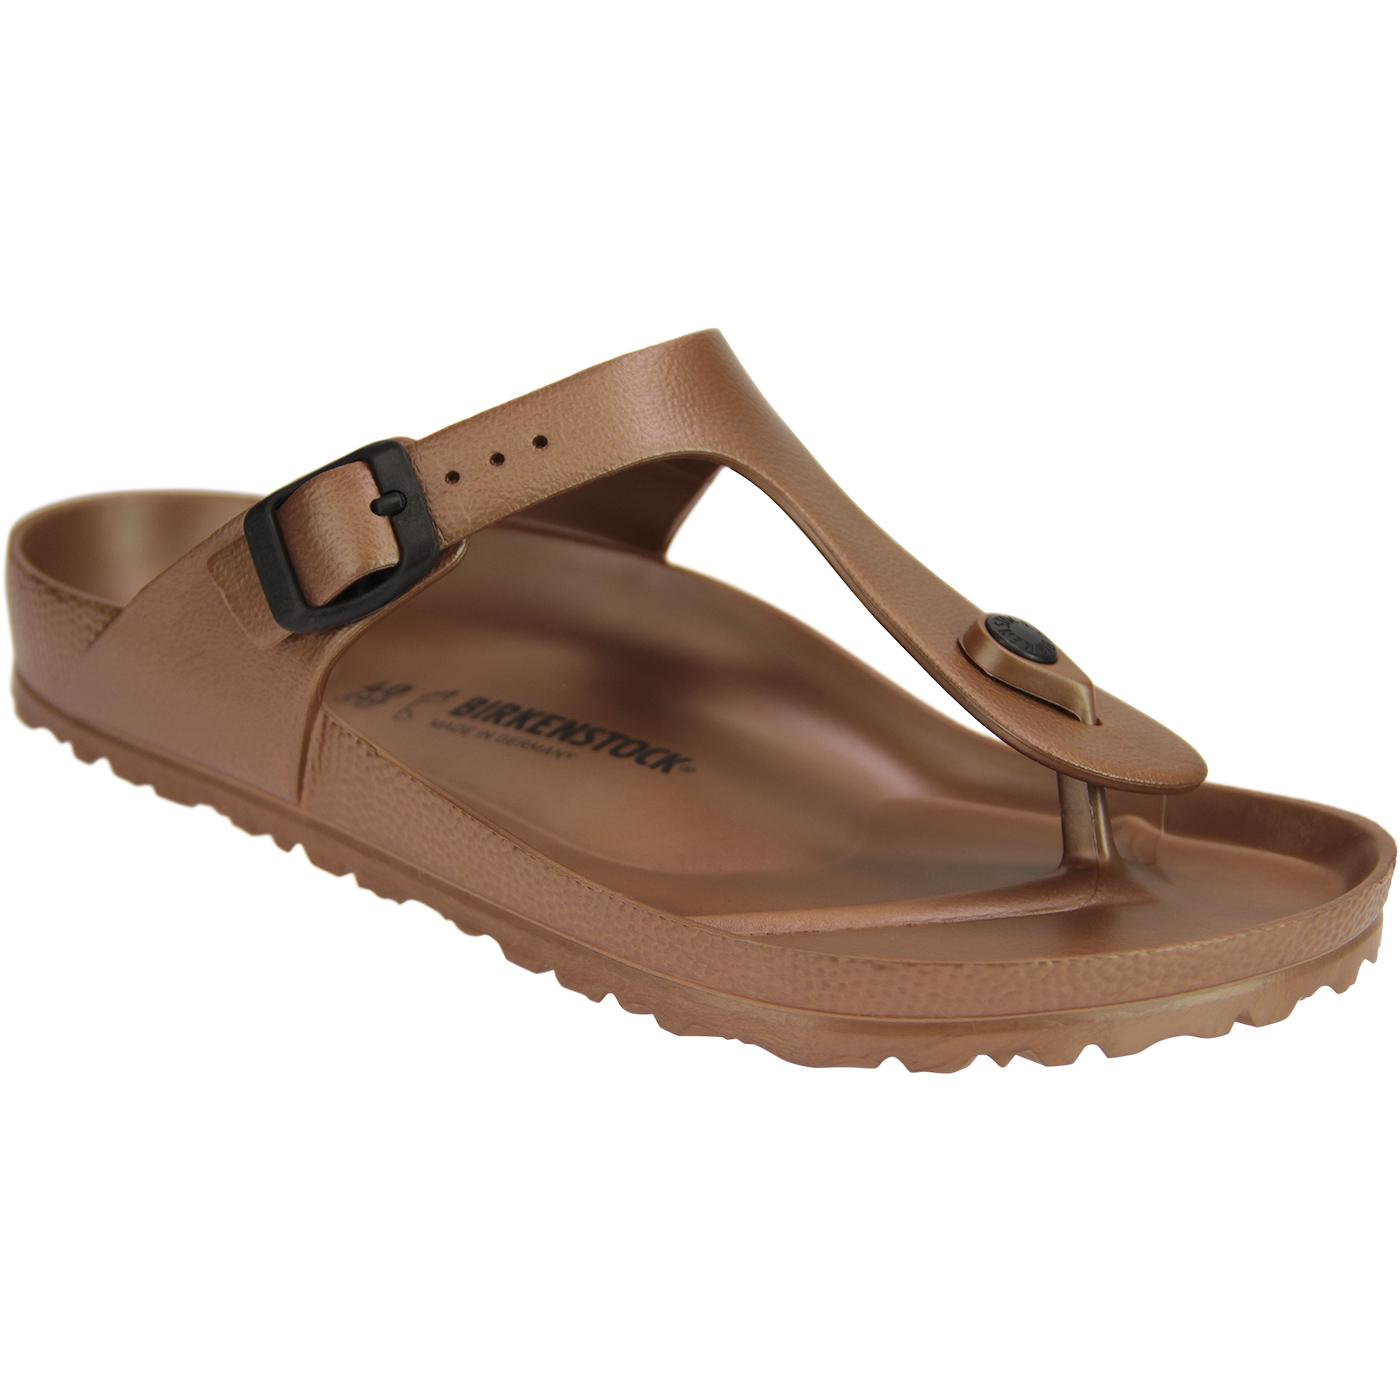 Gizeh EVA BIRKENSTOCK Mens Toe Grip Sandals Copper